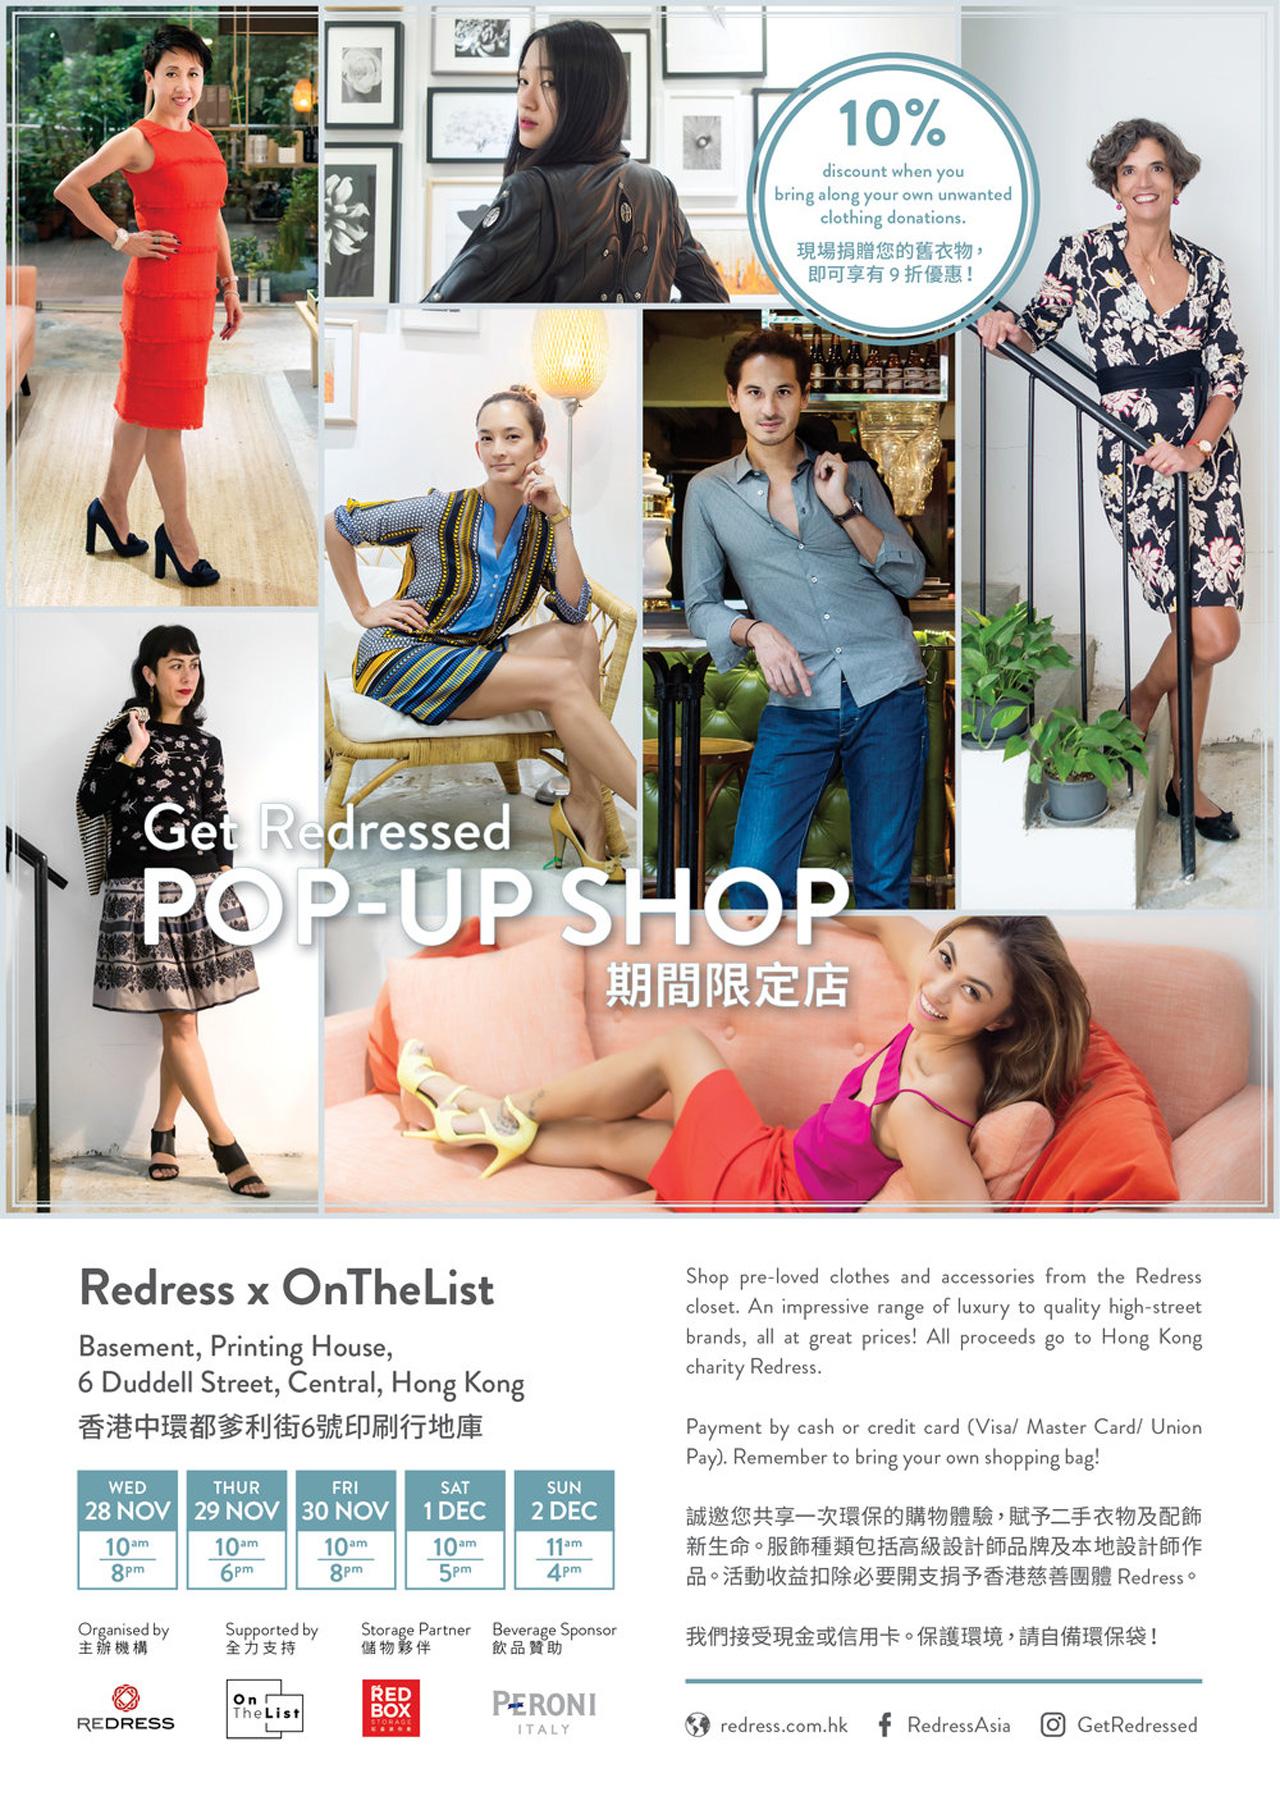 Get Redressed Pop-up Shop